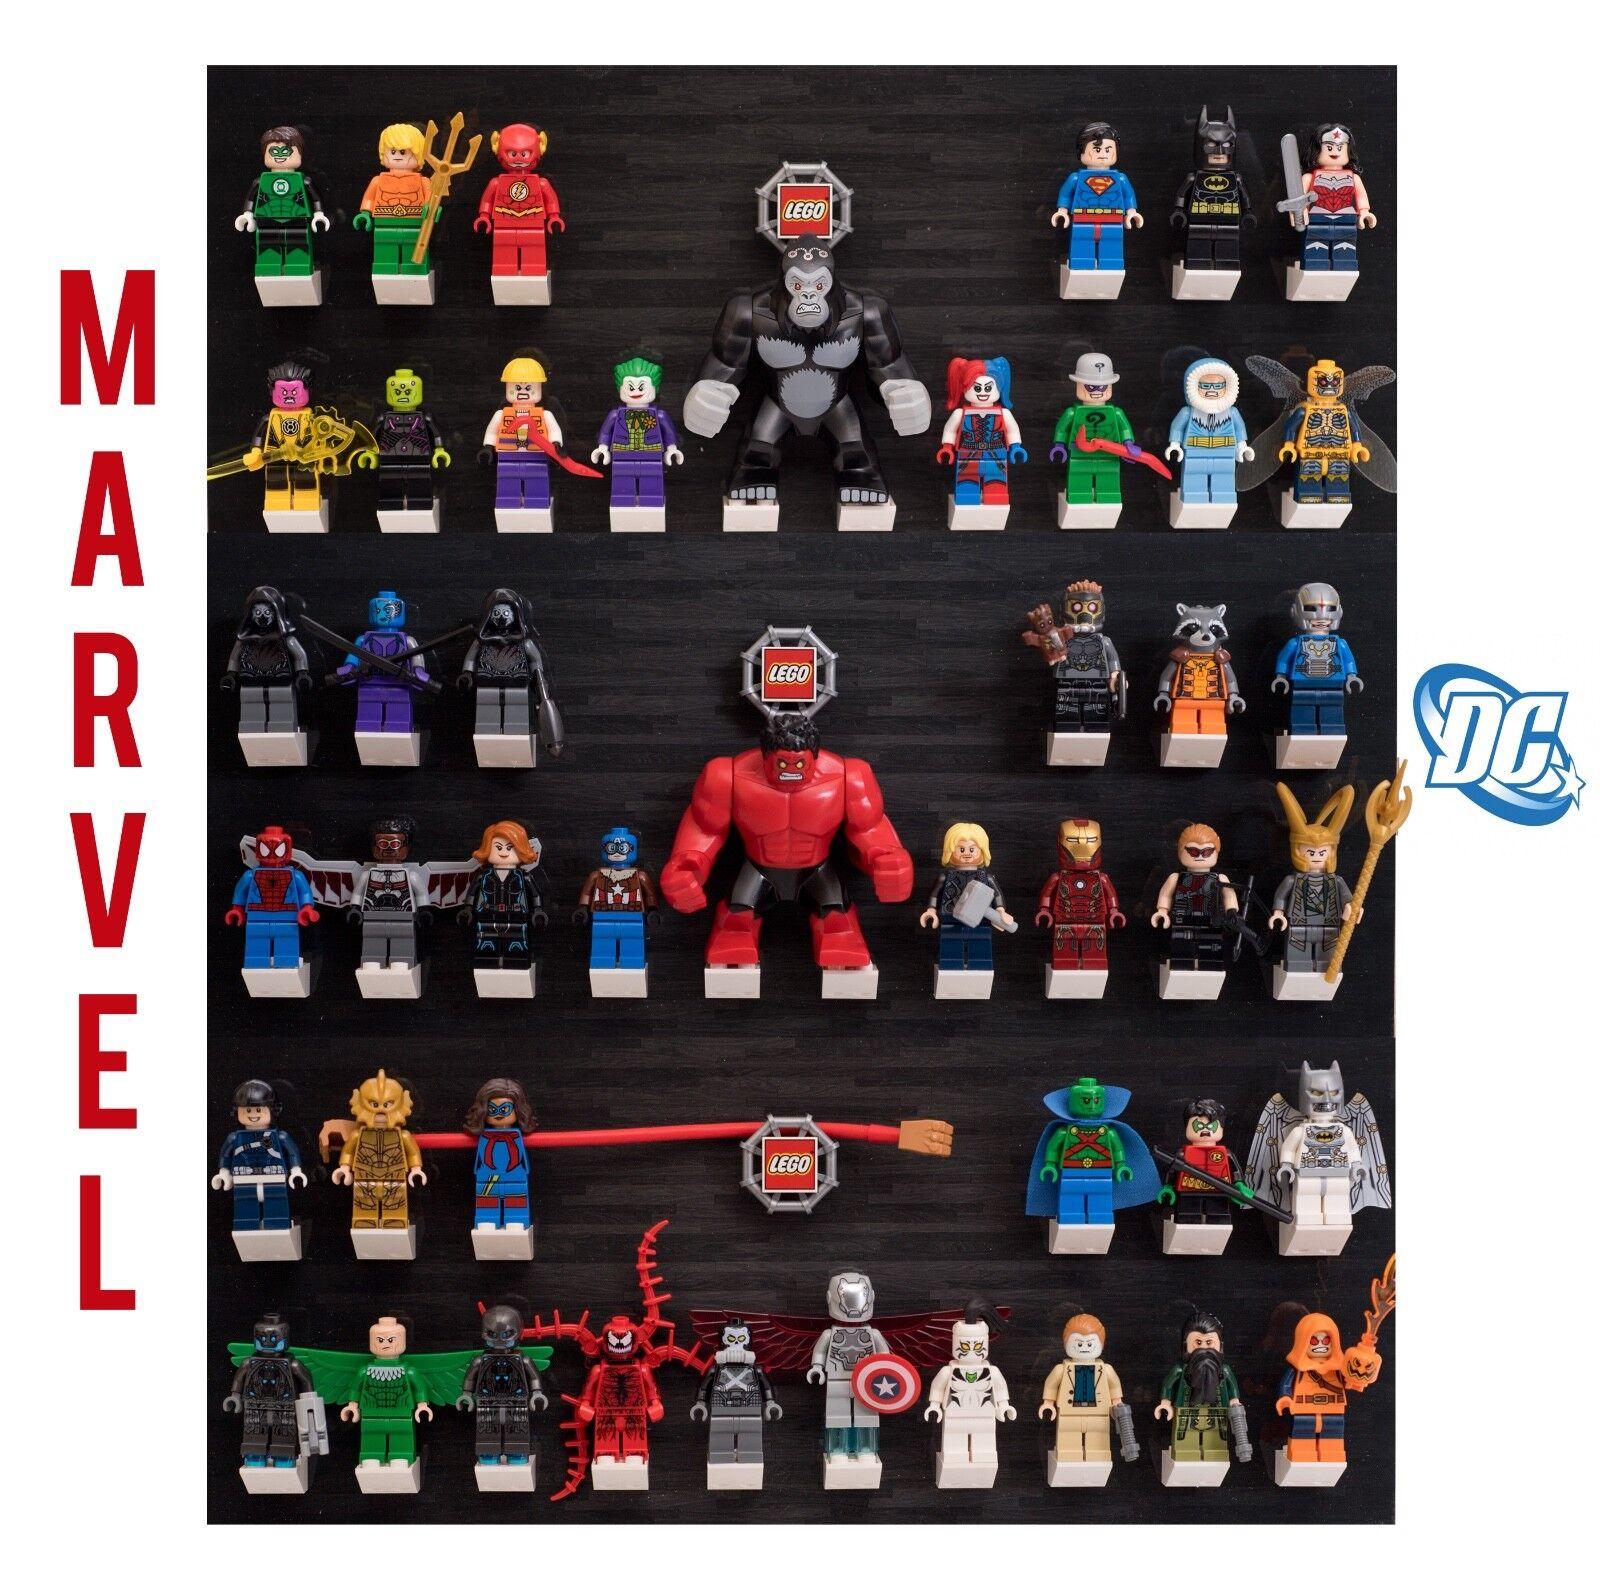 Huge Lot of 50 New Lego Minifigures - Marvel DC Superheroes - Batman - Avengers